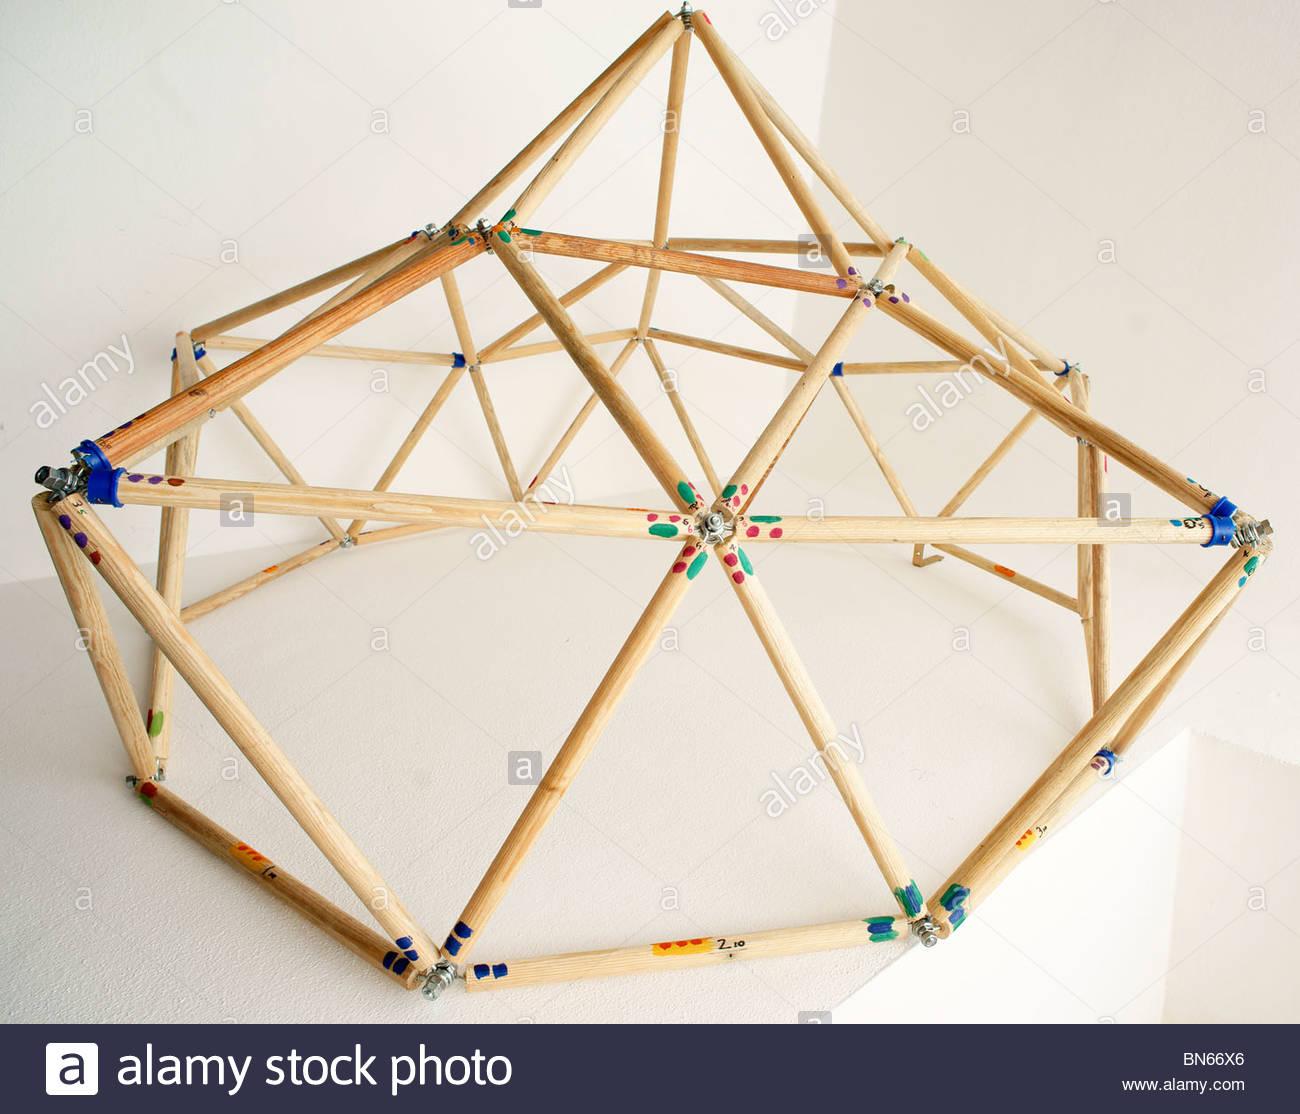 Handmade toy Geodesic Dome Stock Photo: 30255294 - Alamy